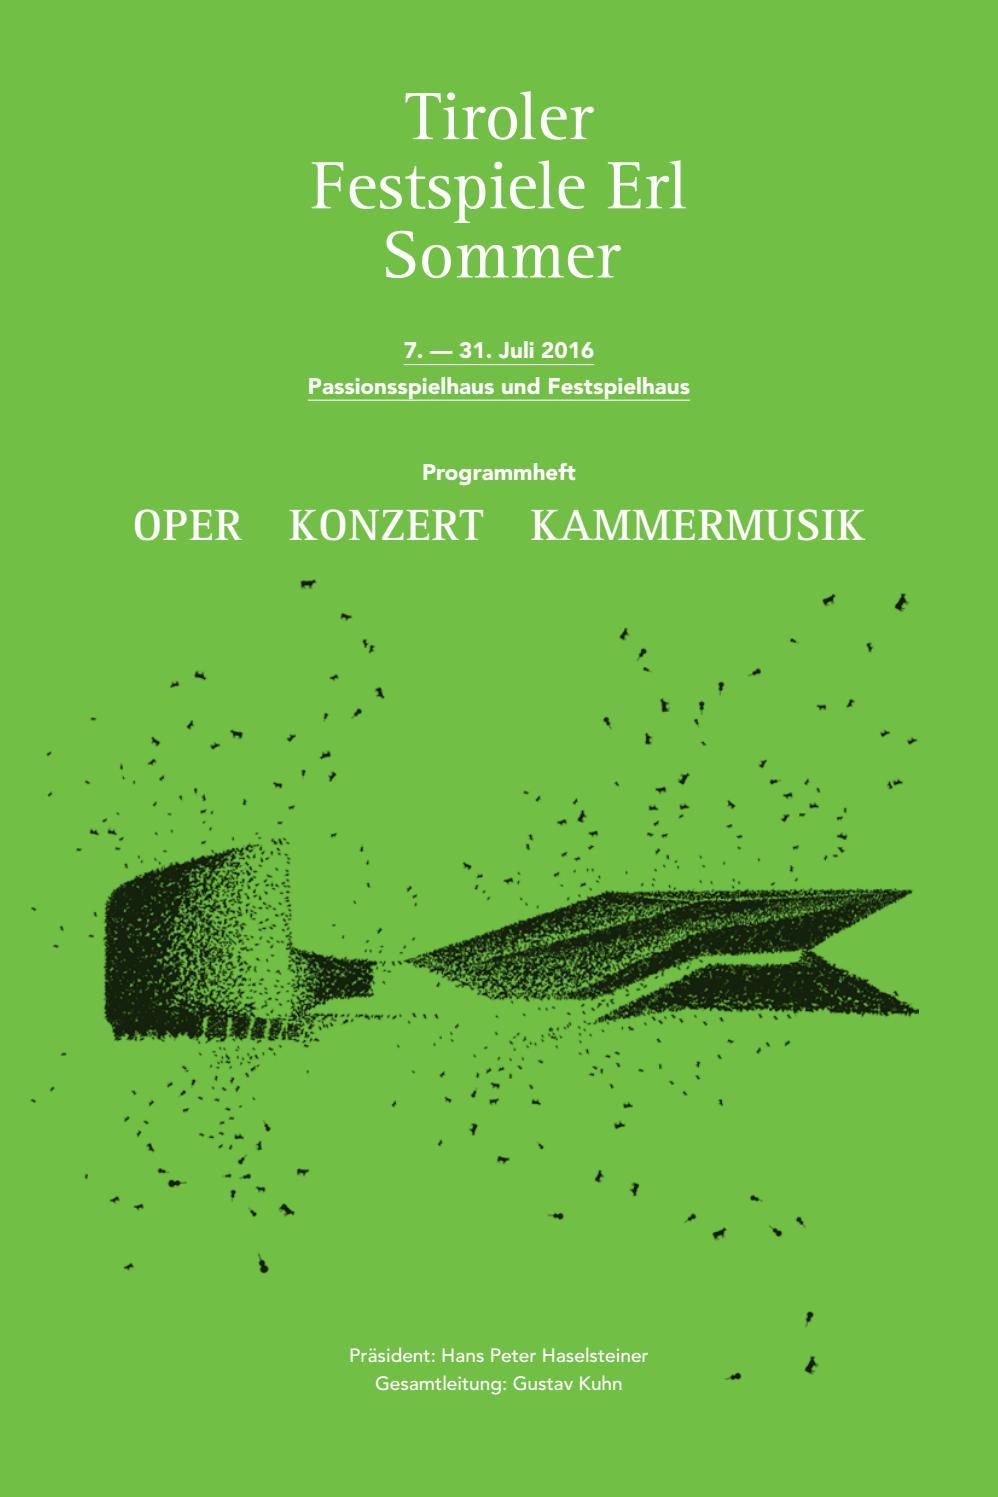 Abendprogramm Sommer 2016 by Tiroler Festspiele Erl Betriebsges ...